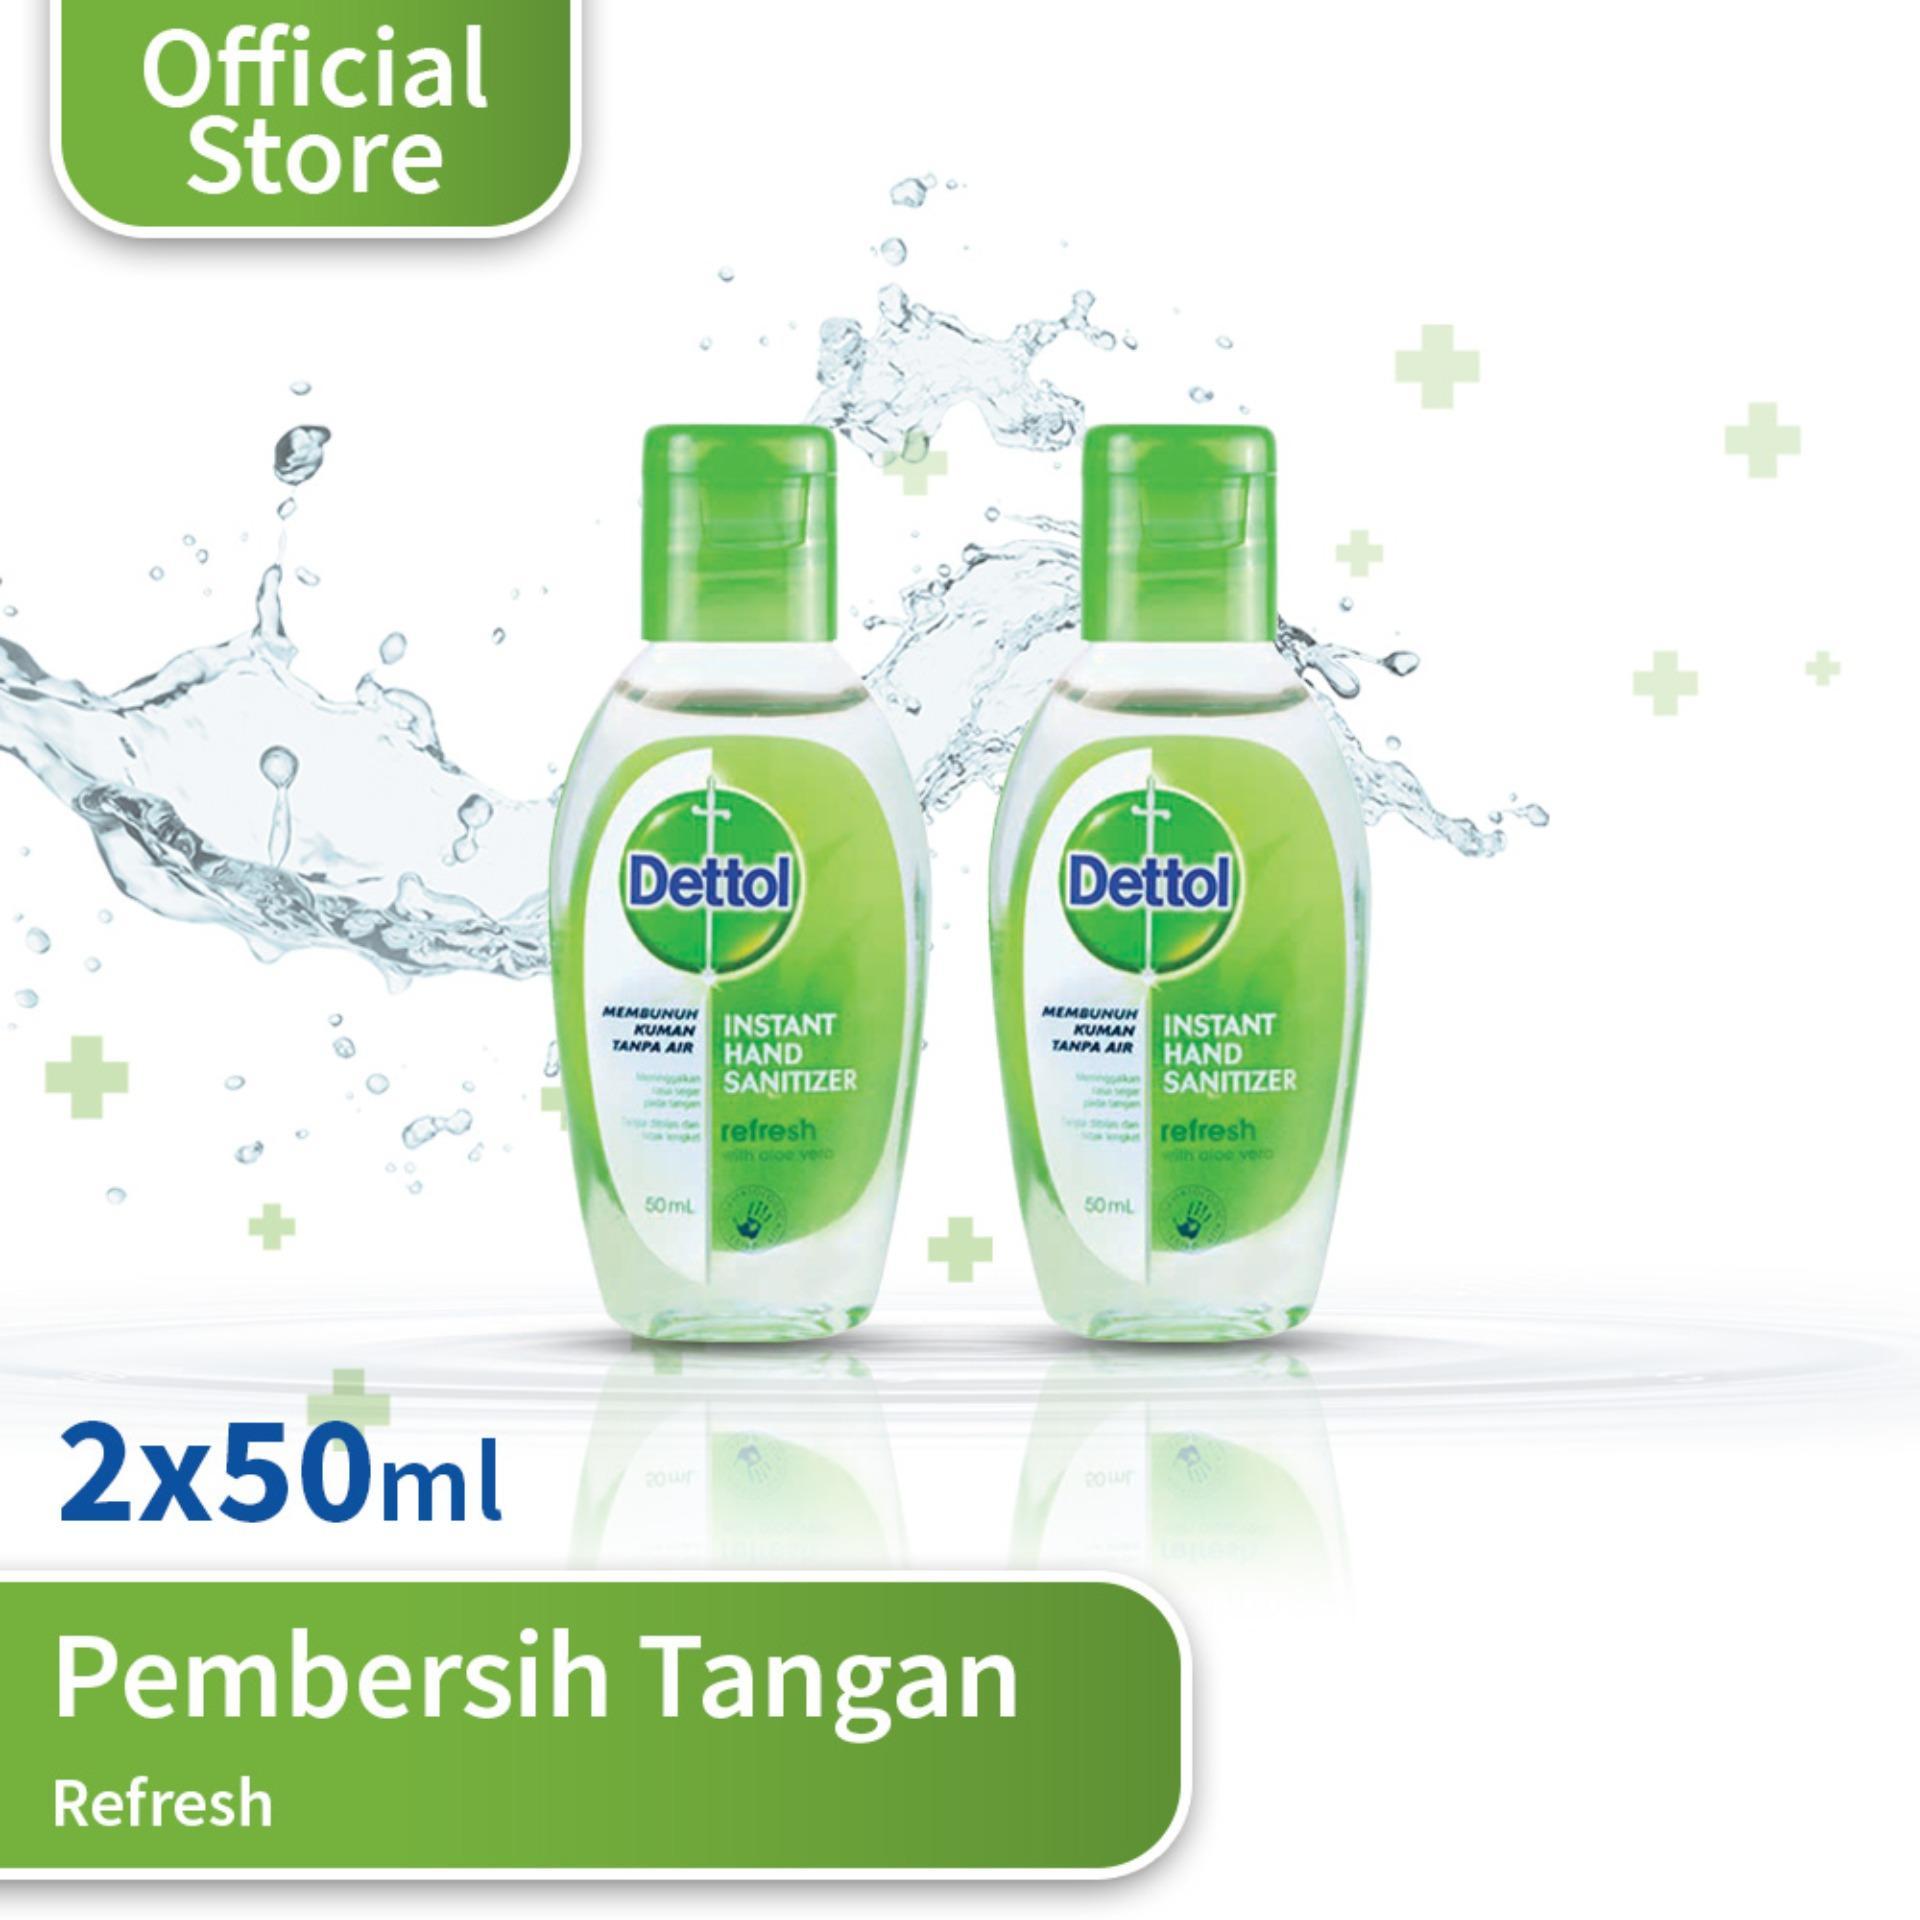 Dettol Hand Sanitizer Refresh 50 Ml (2 Pcs) By Dettol Official Store